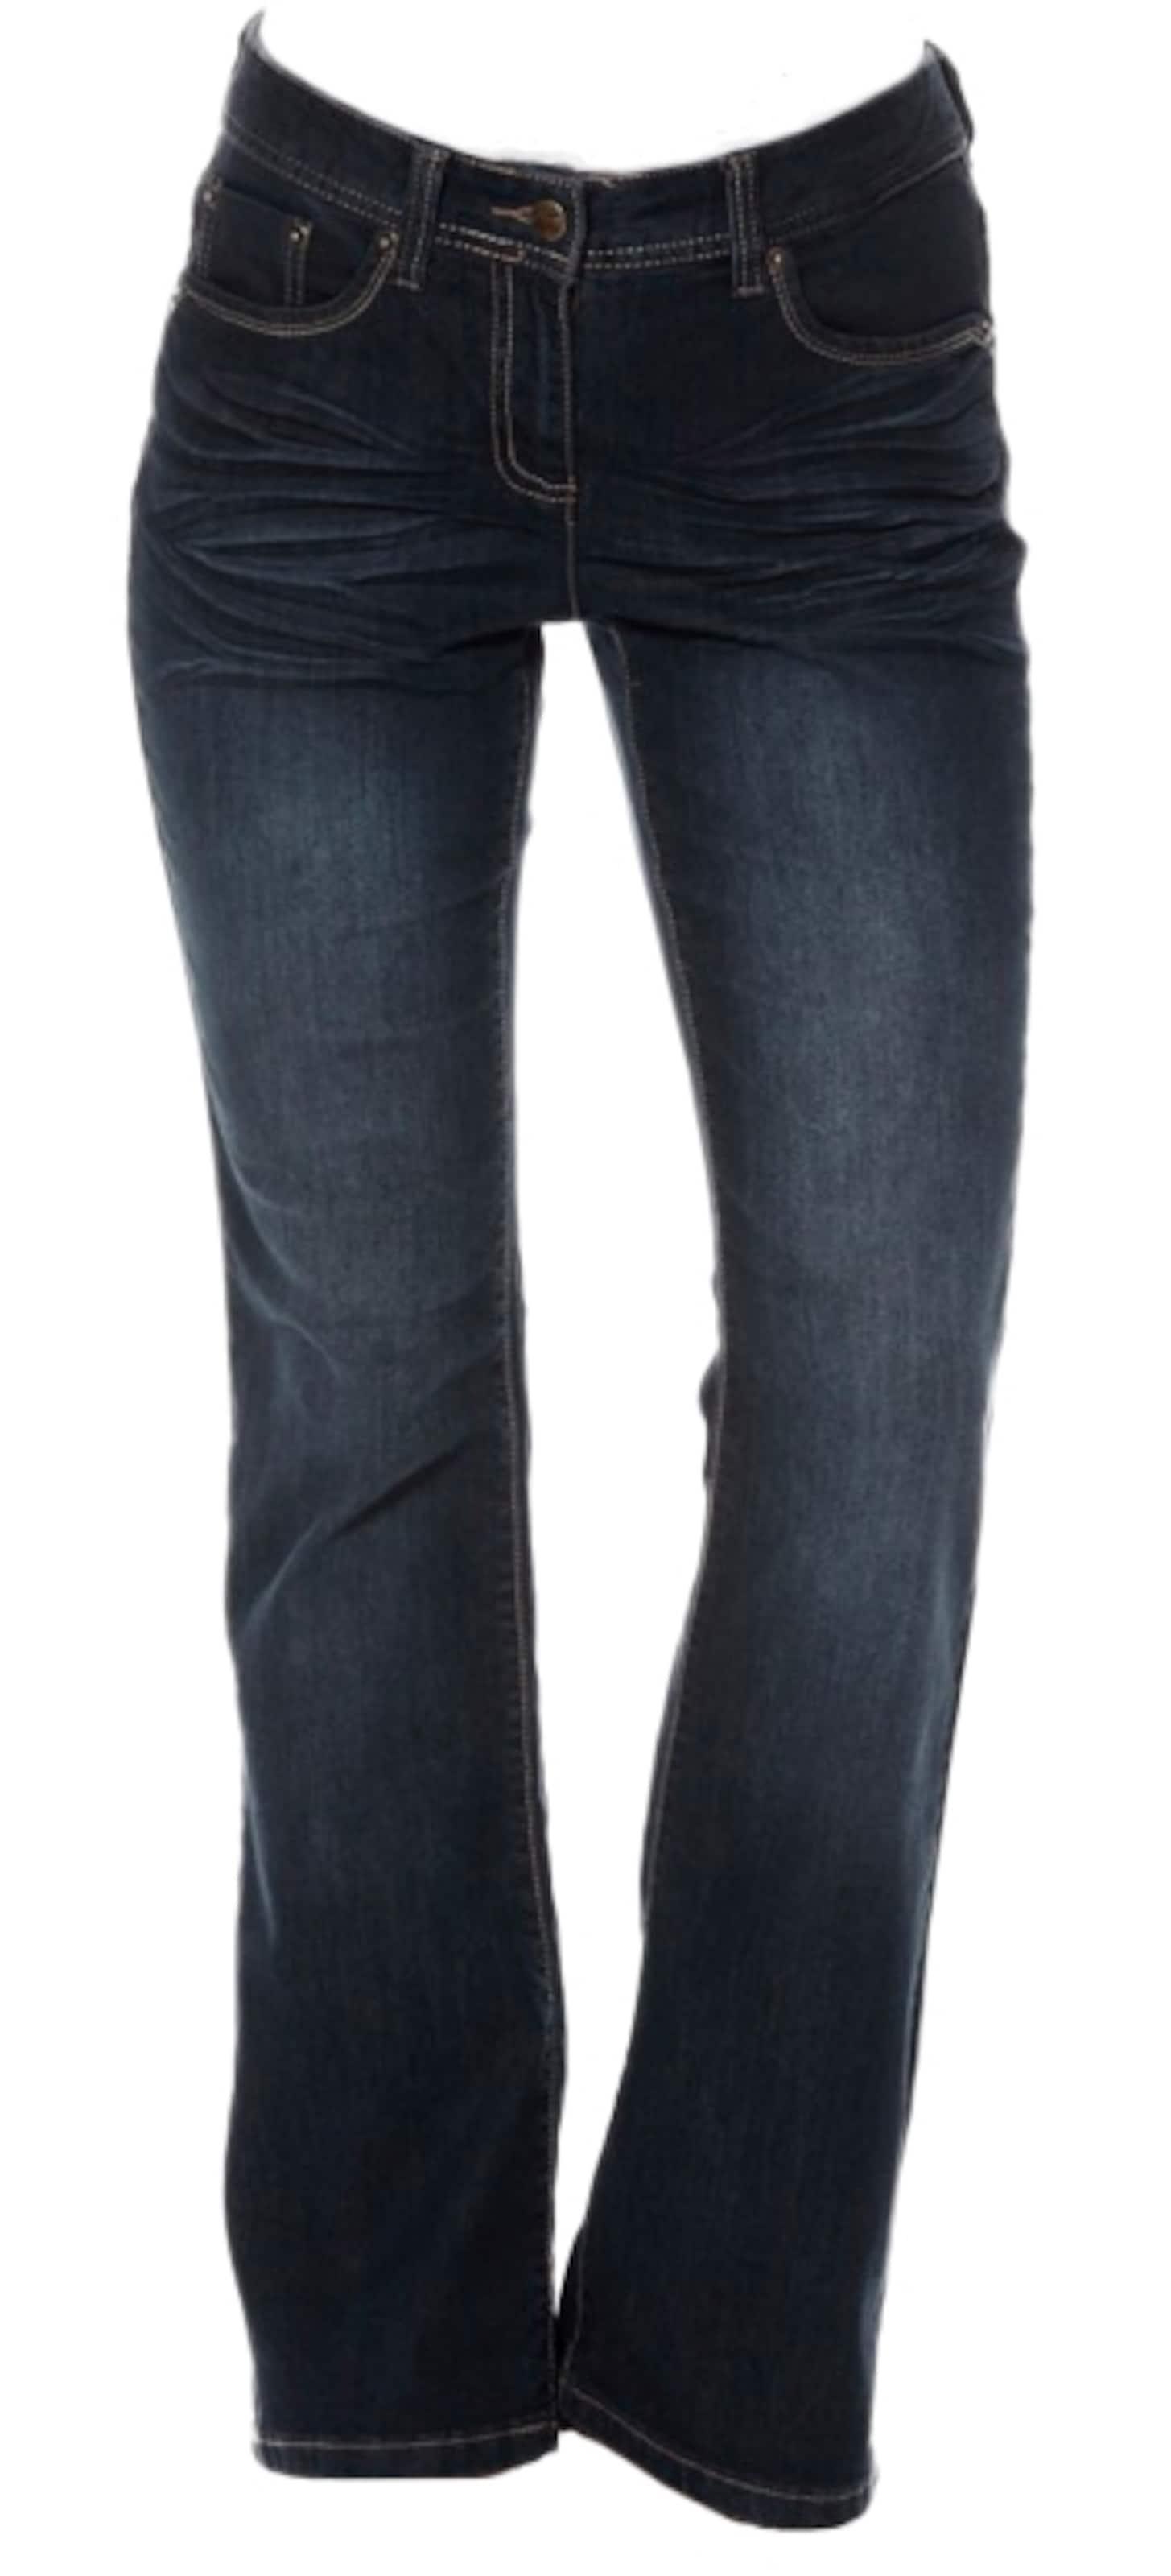 CHEER Bootcut Jeans Beste Angebote Die Billigsten Freie Versandrabatte DWpKNPvuHU